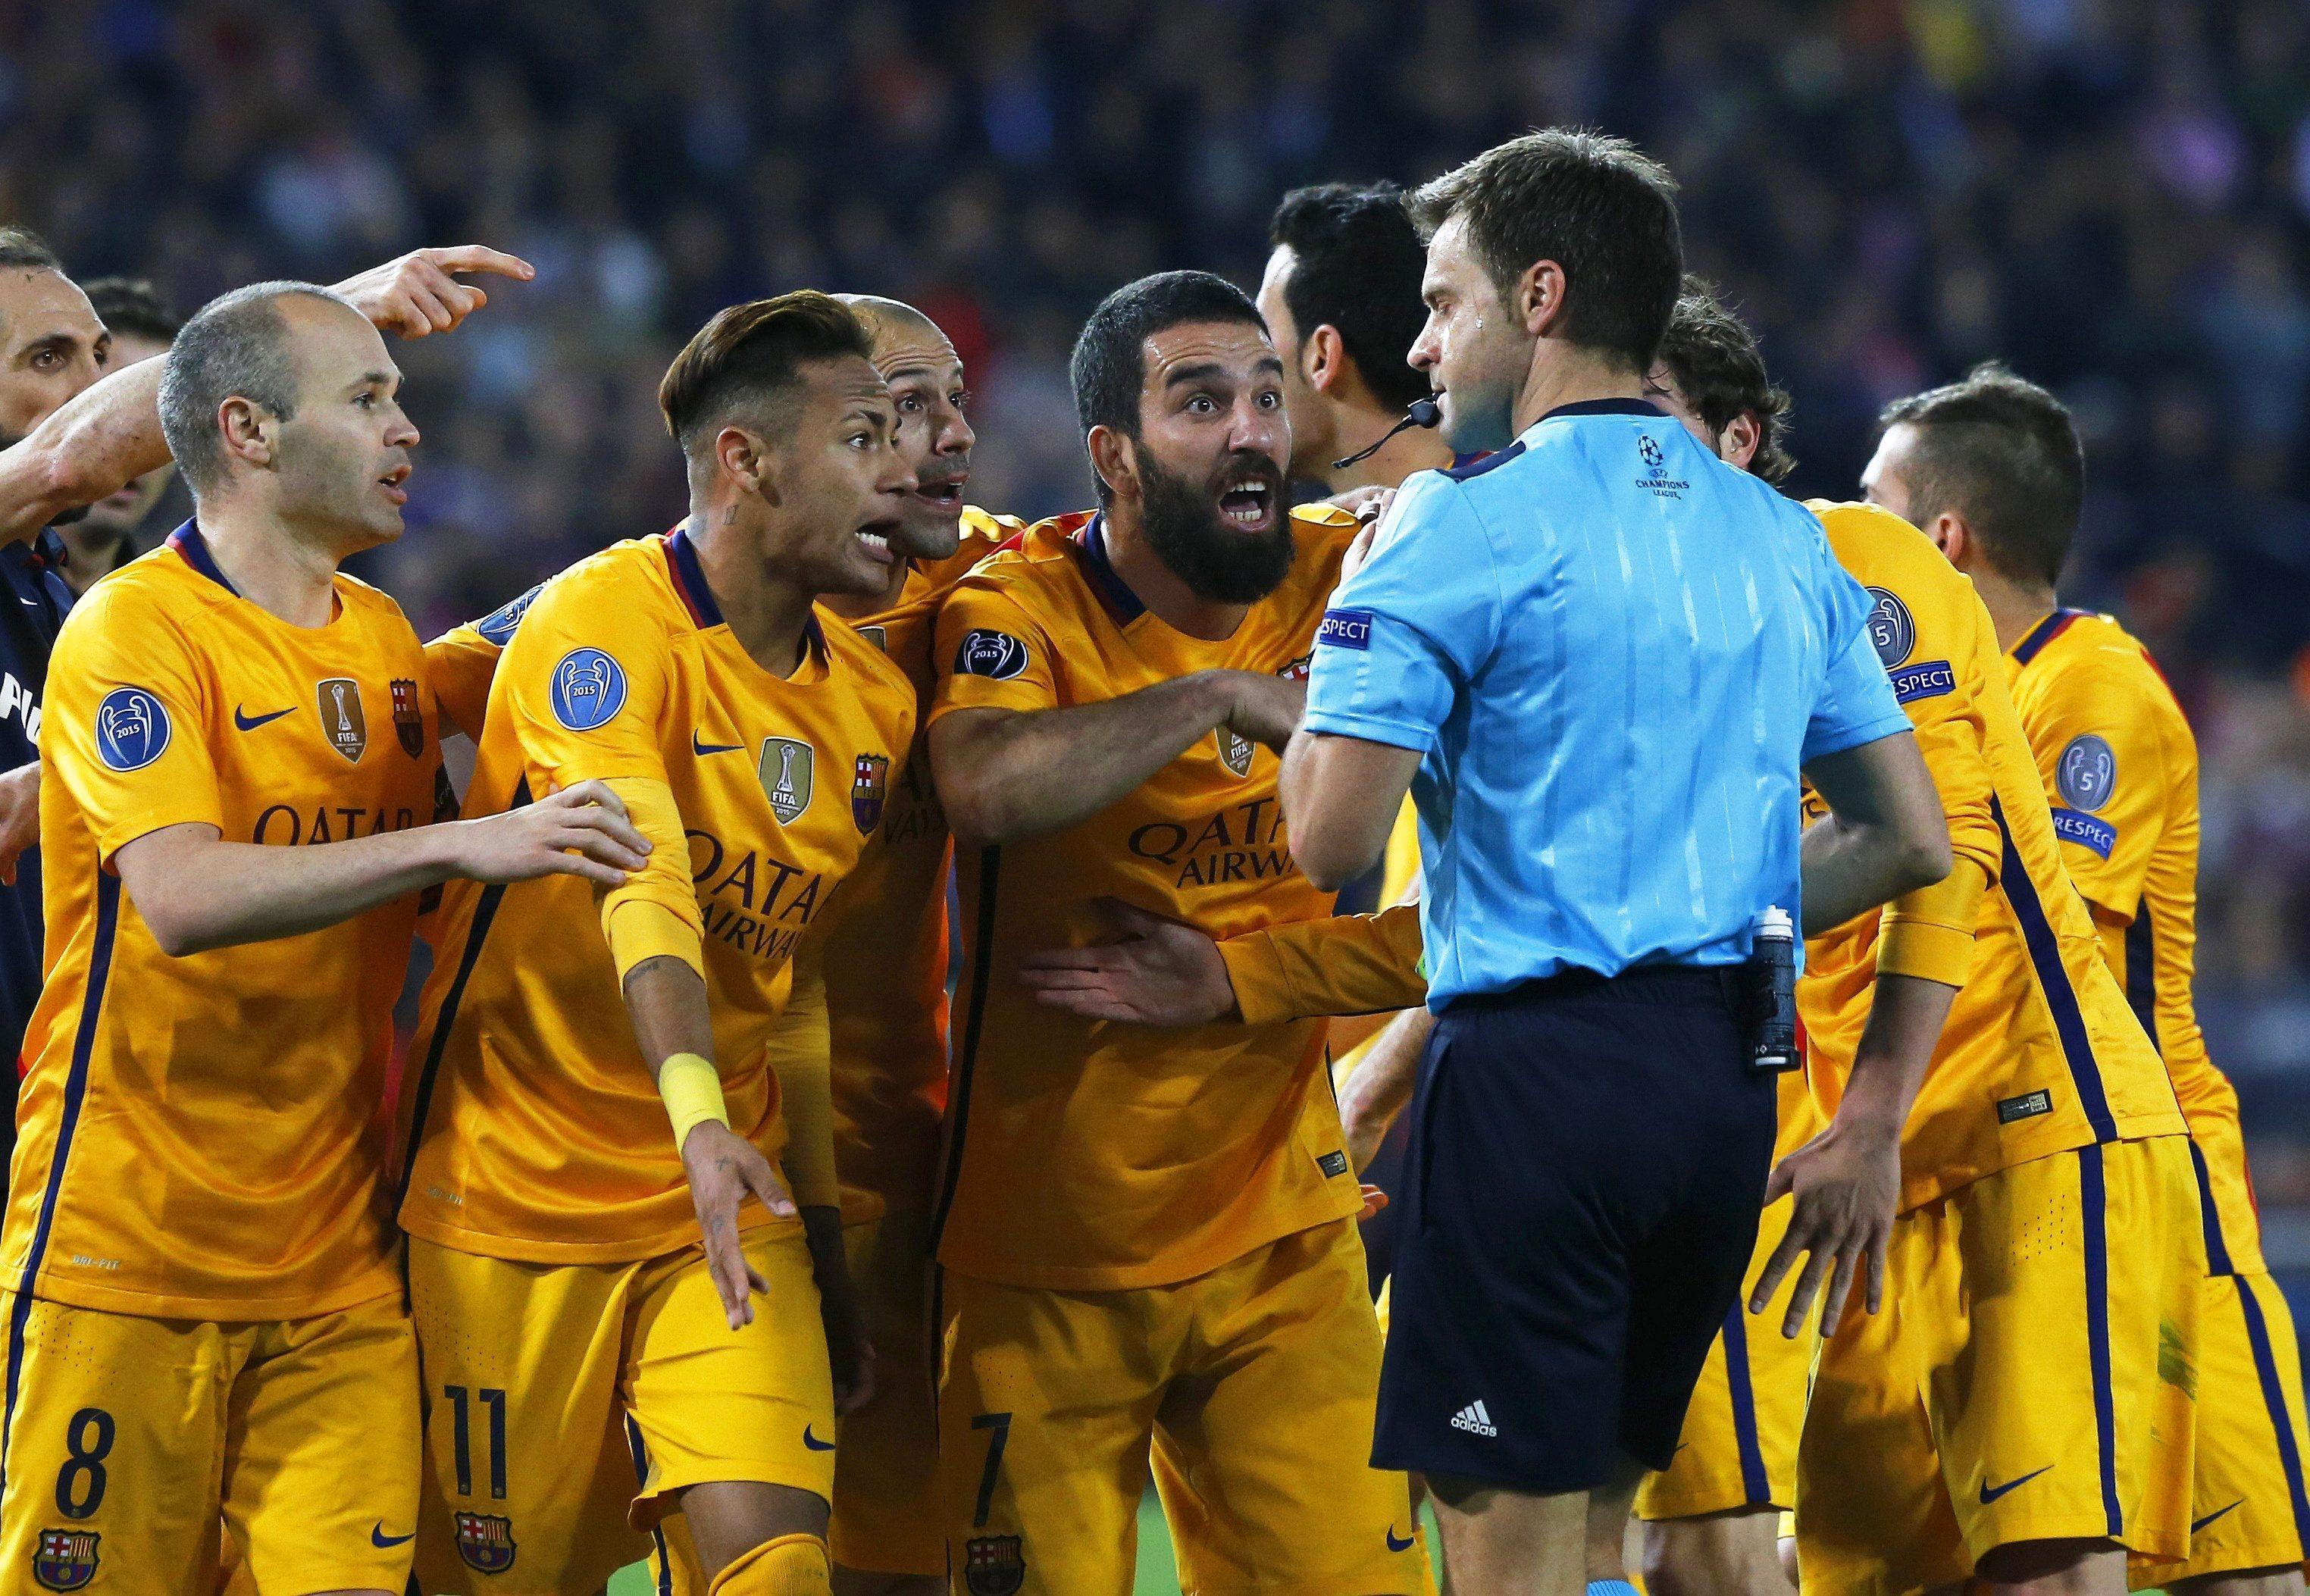 Rizzoli chwali fair play Barçy